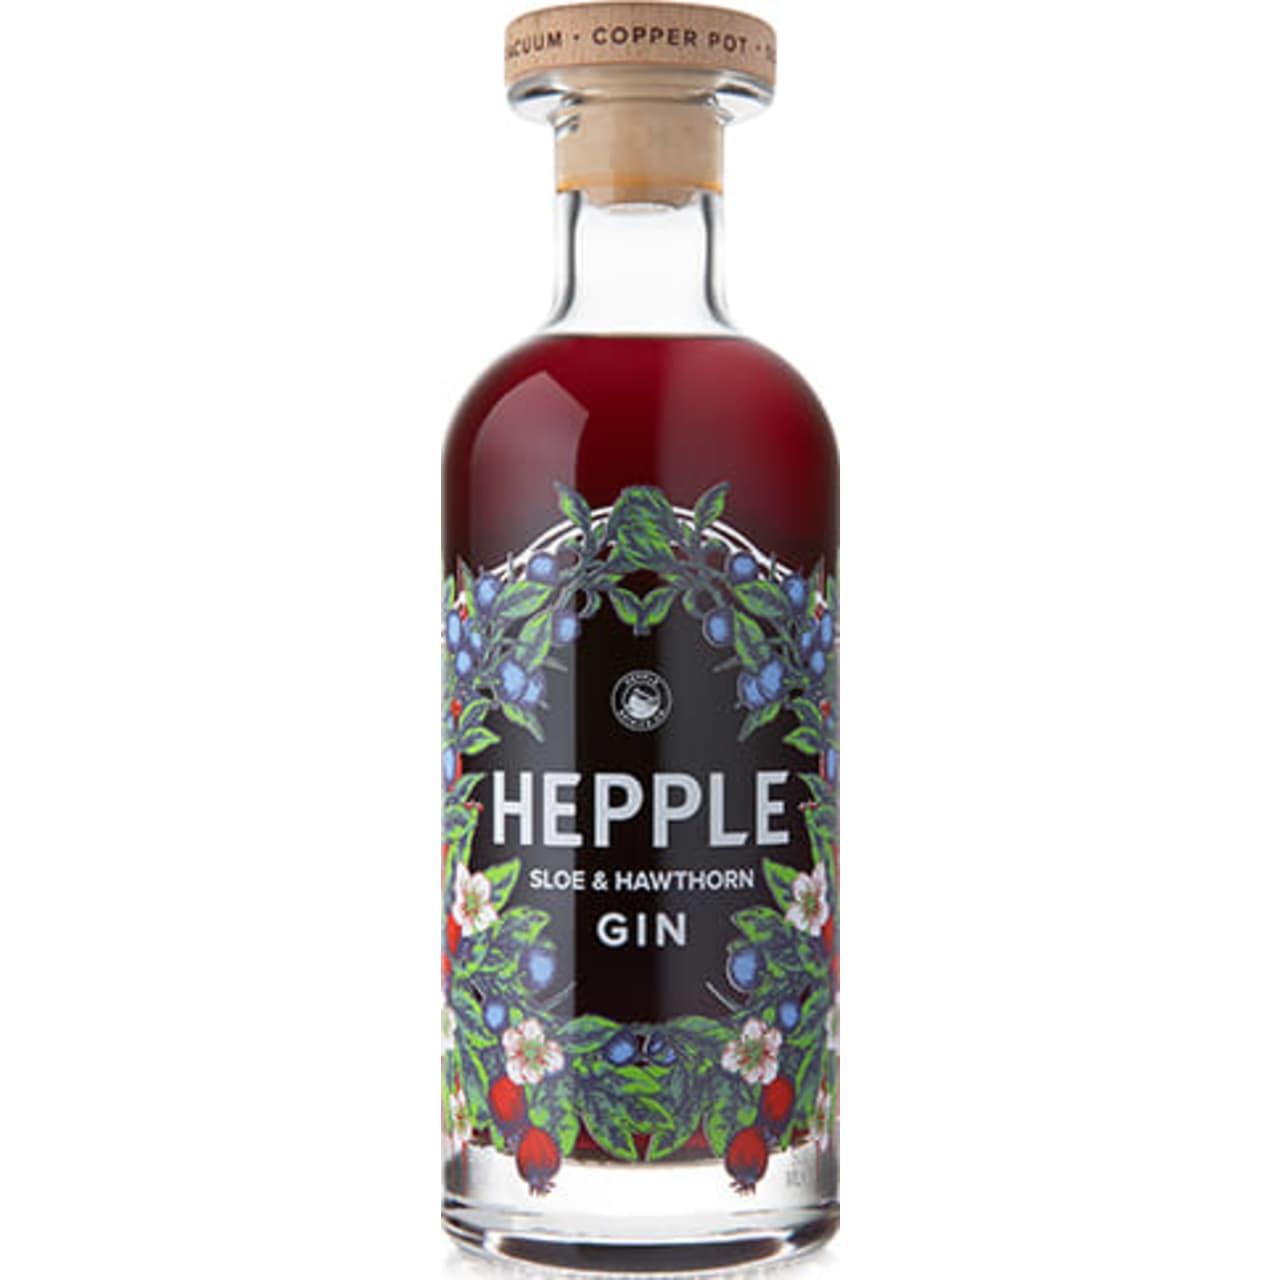 Product Image - Hepple Sloe & Hawthorn Gin